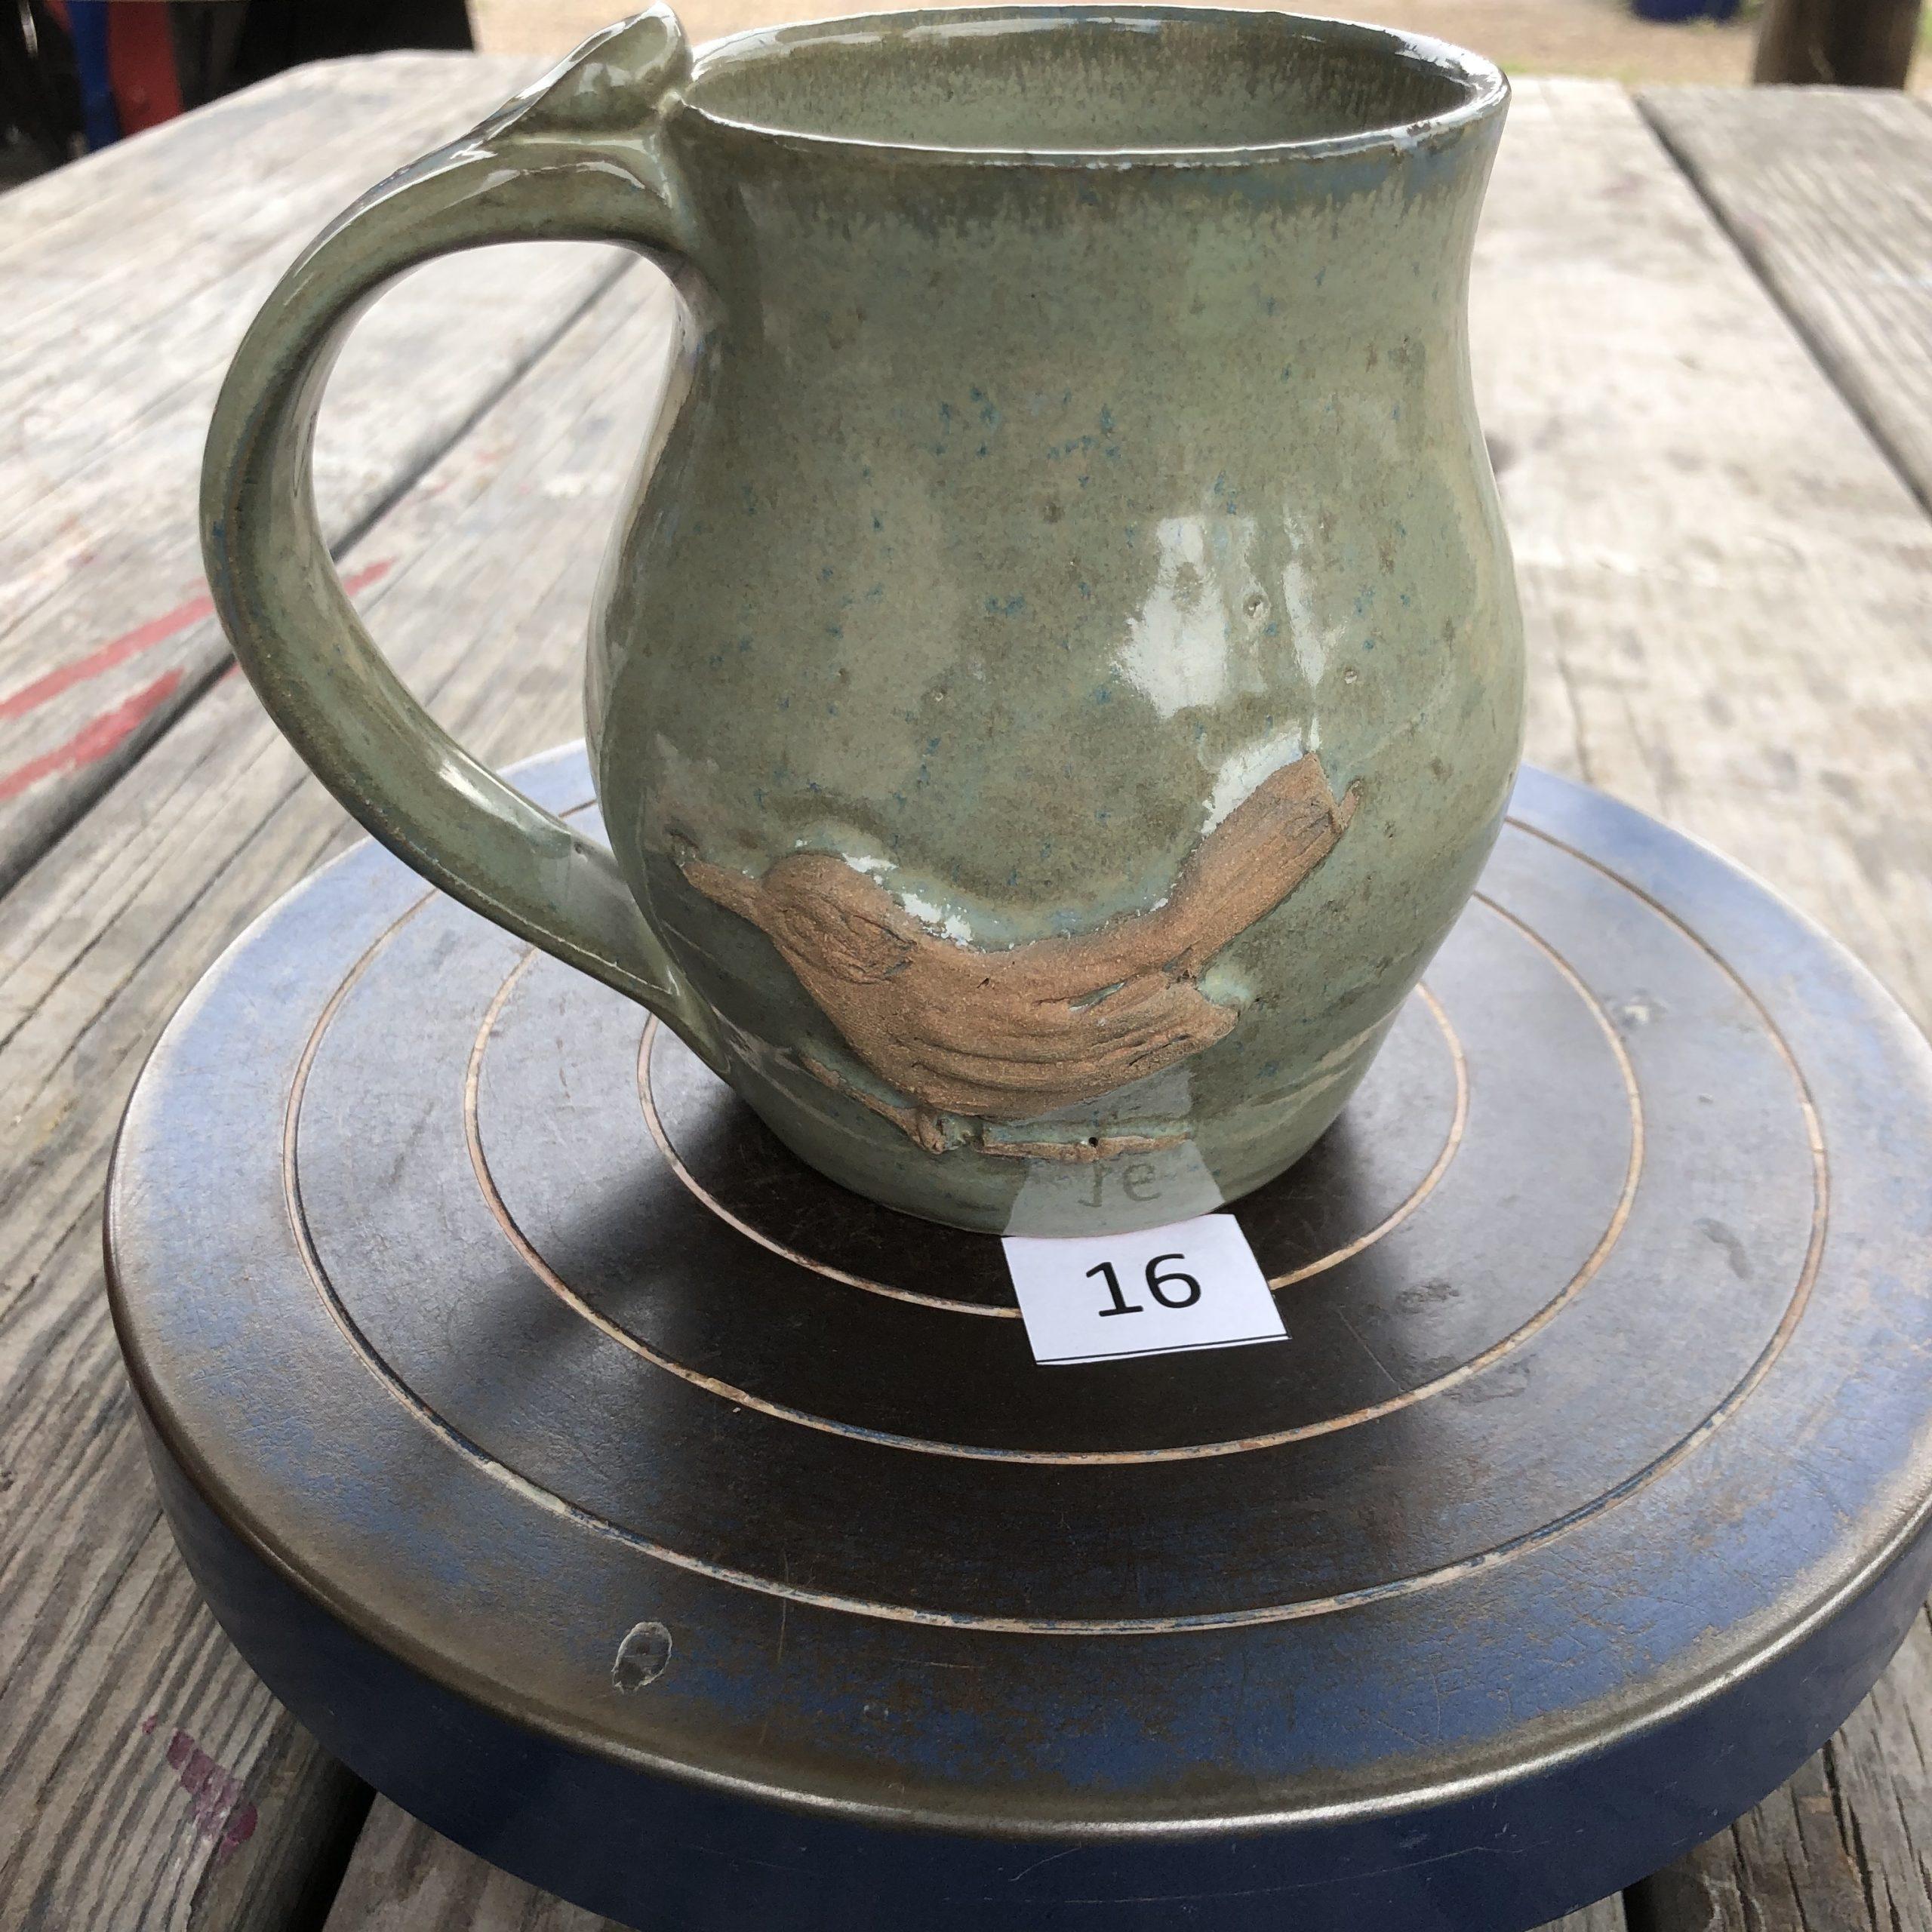 Betsy Curtiss Grey/Green with Bird Mug #16